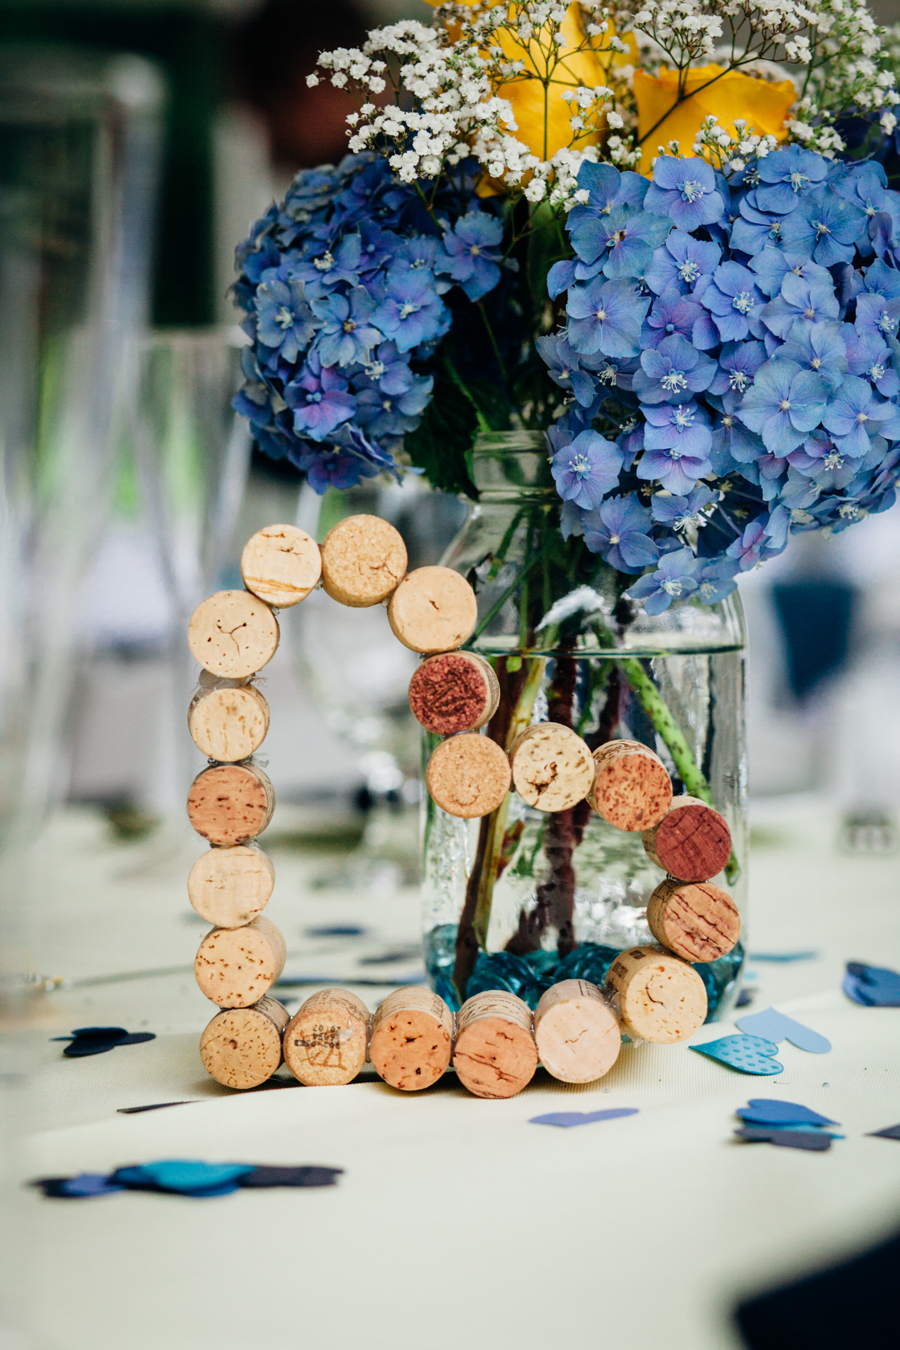 058-lairmont-manor-bellingham-washington-wedding-katheryn-moran-photography.jpg